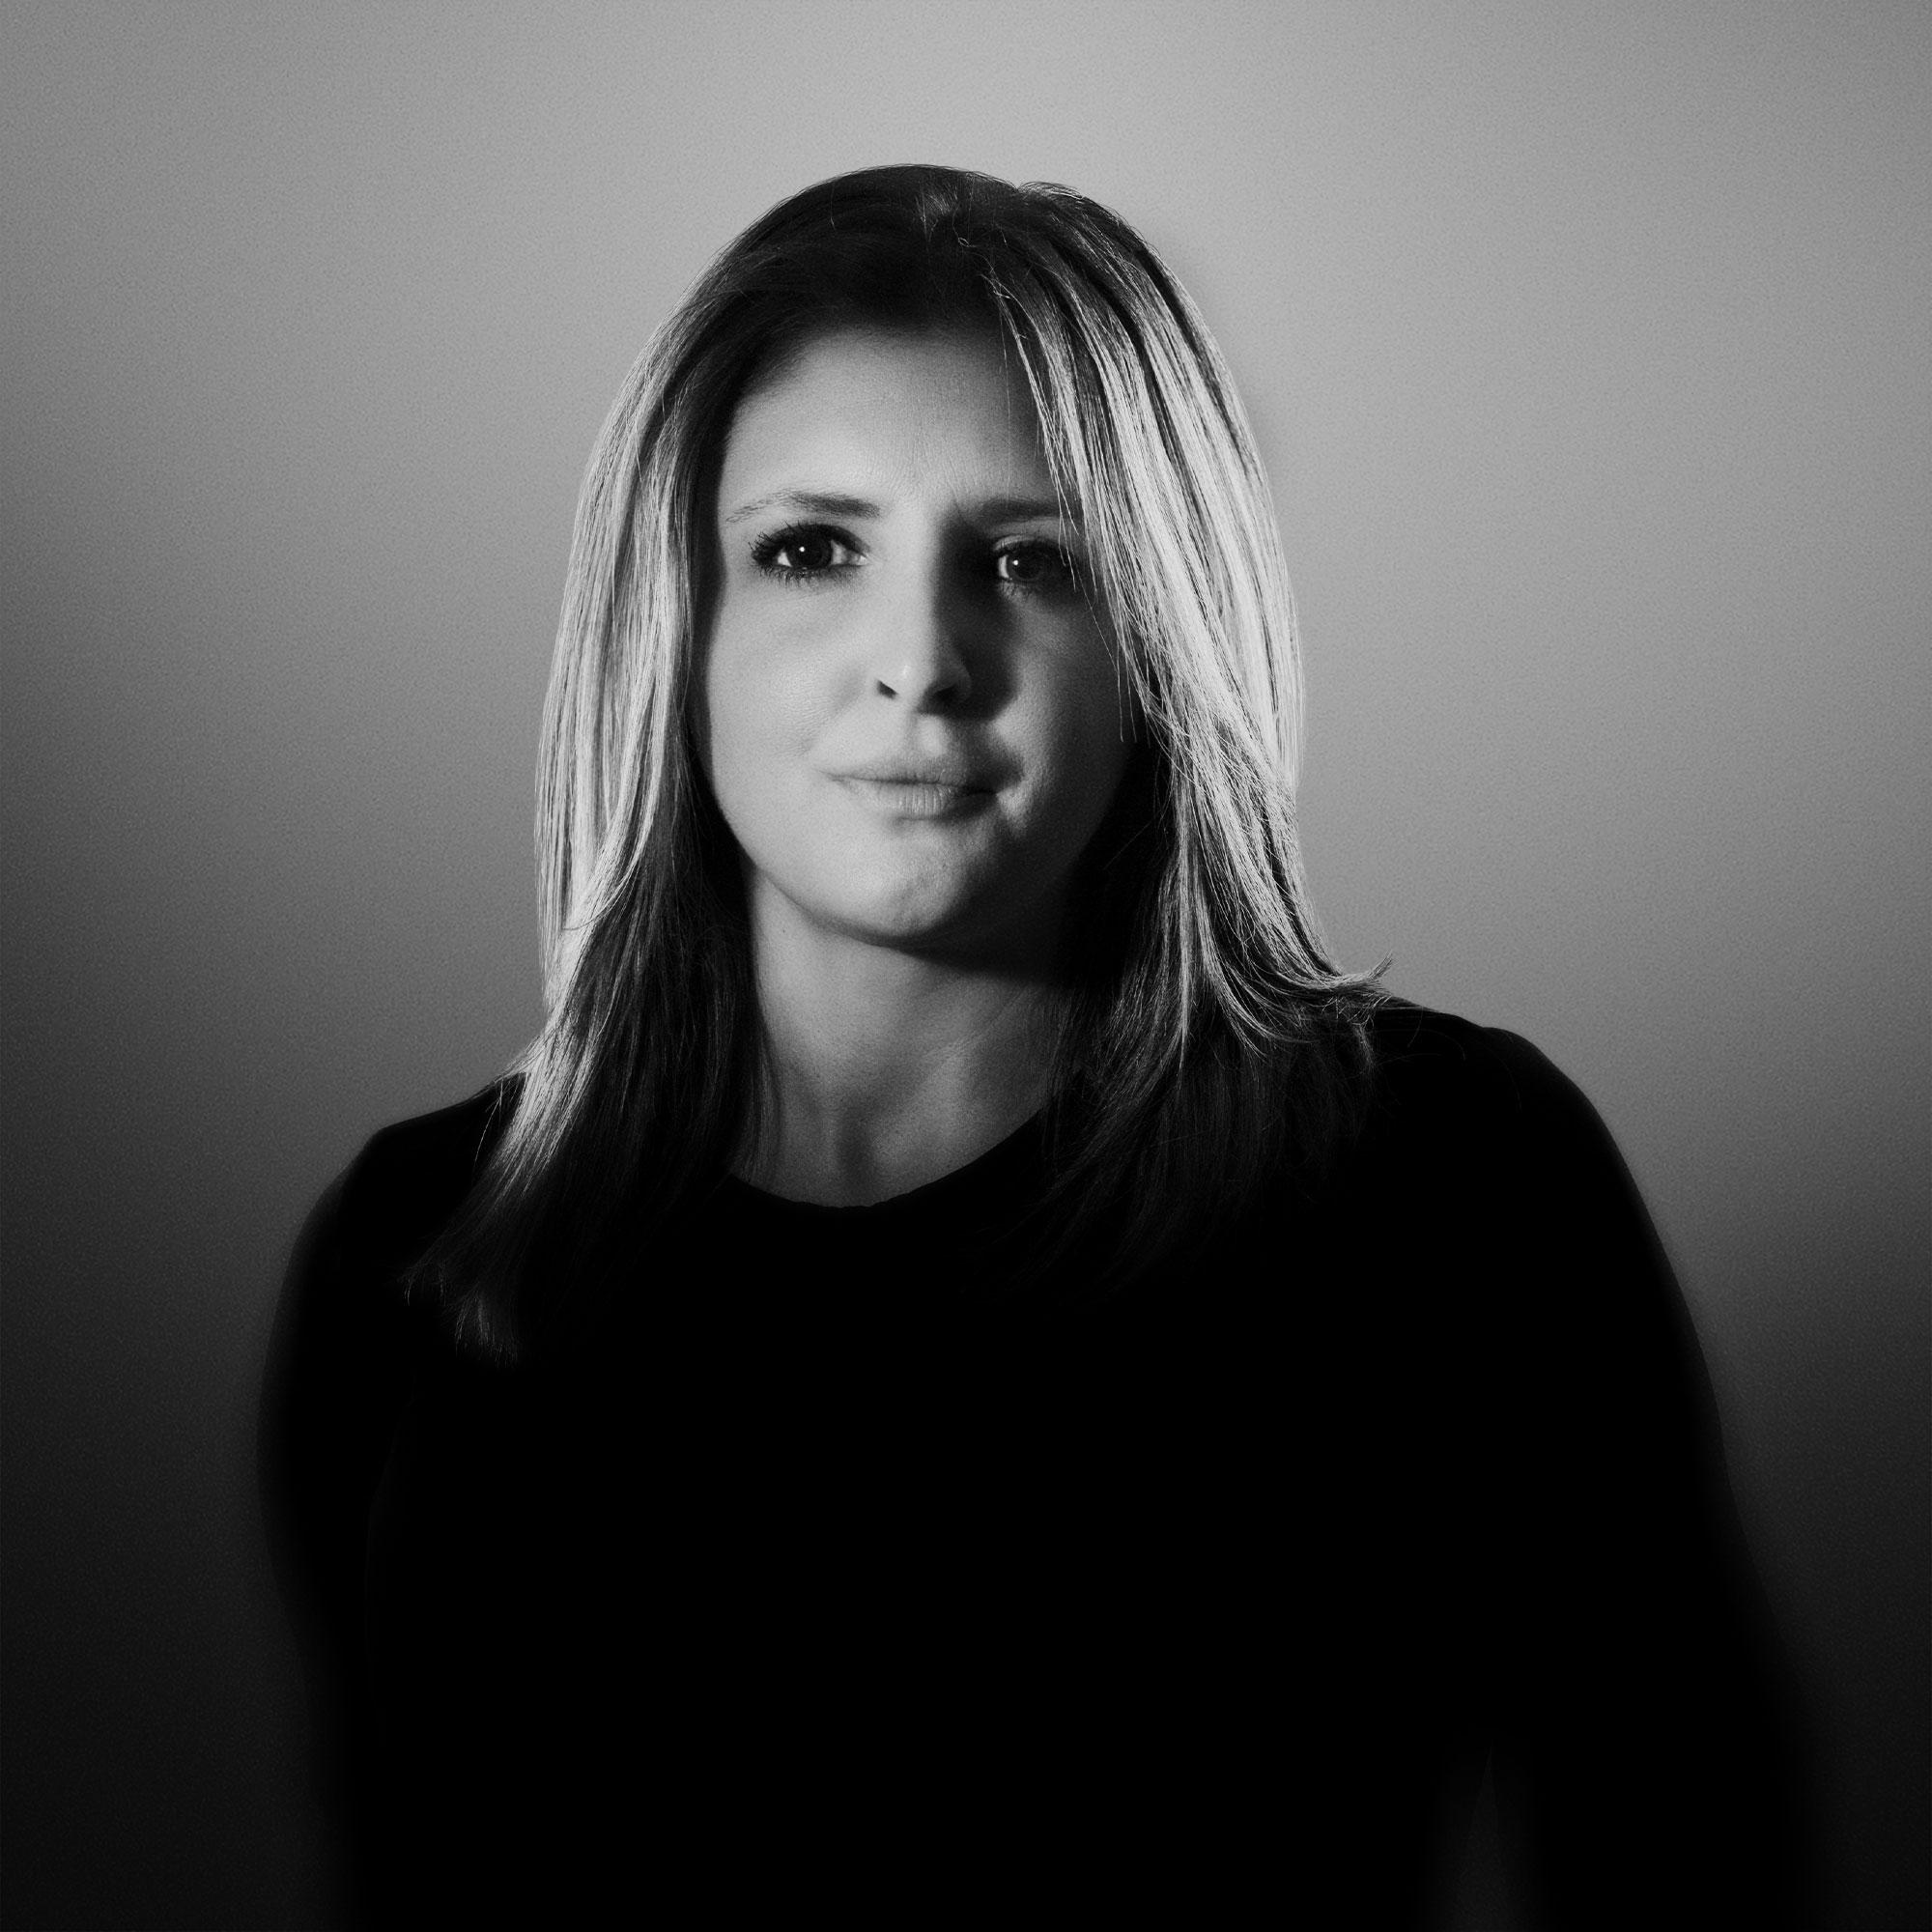 Alexis Ottier